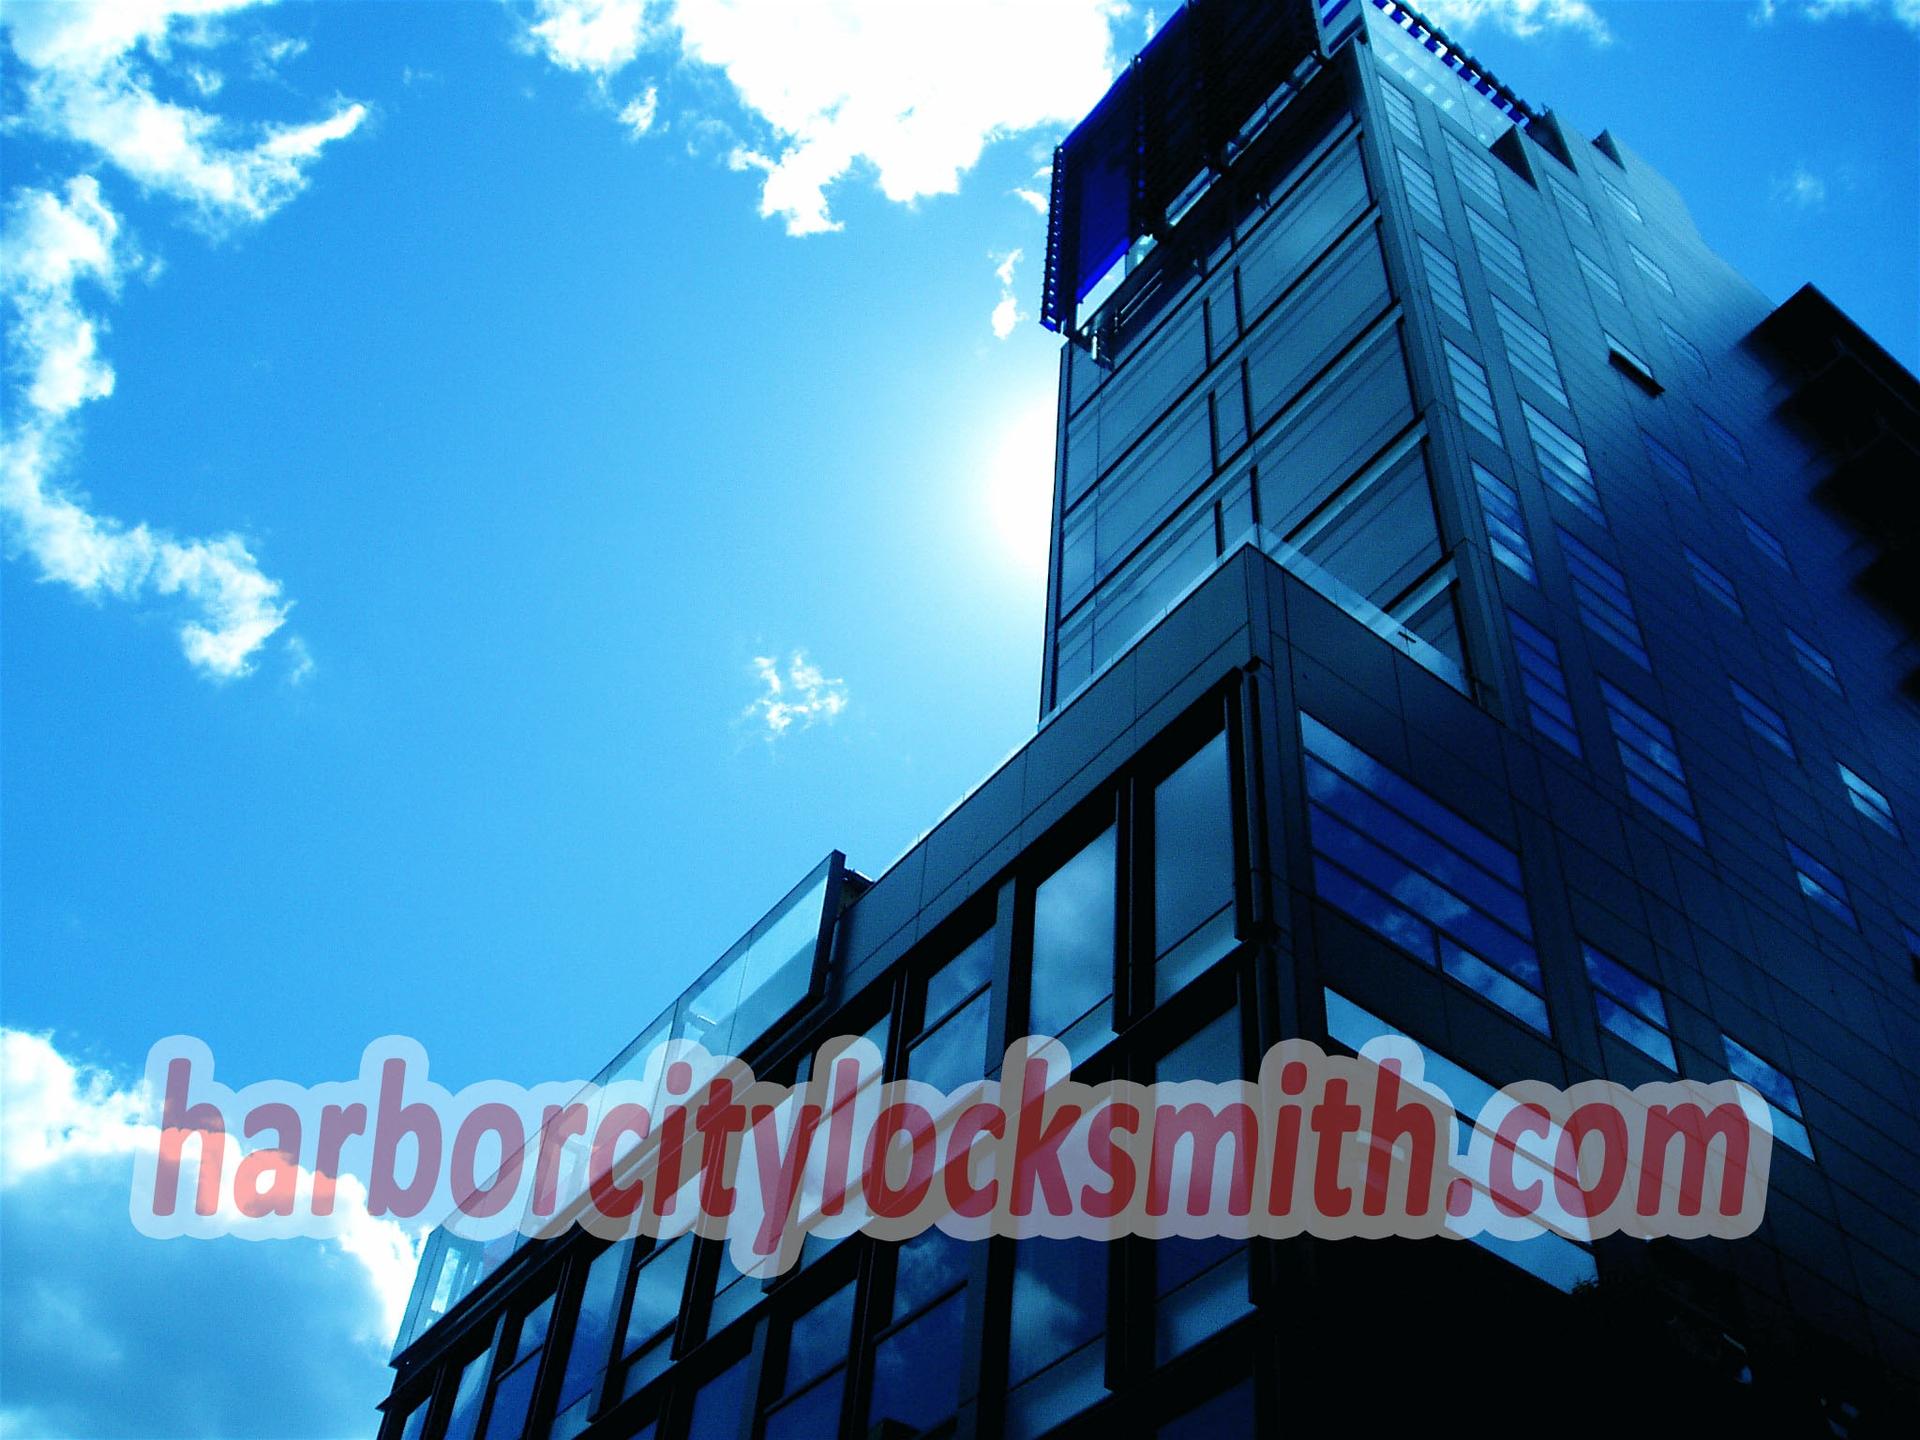 Harbor City Locksmith (@harborcityloc) Cover Image